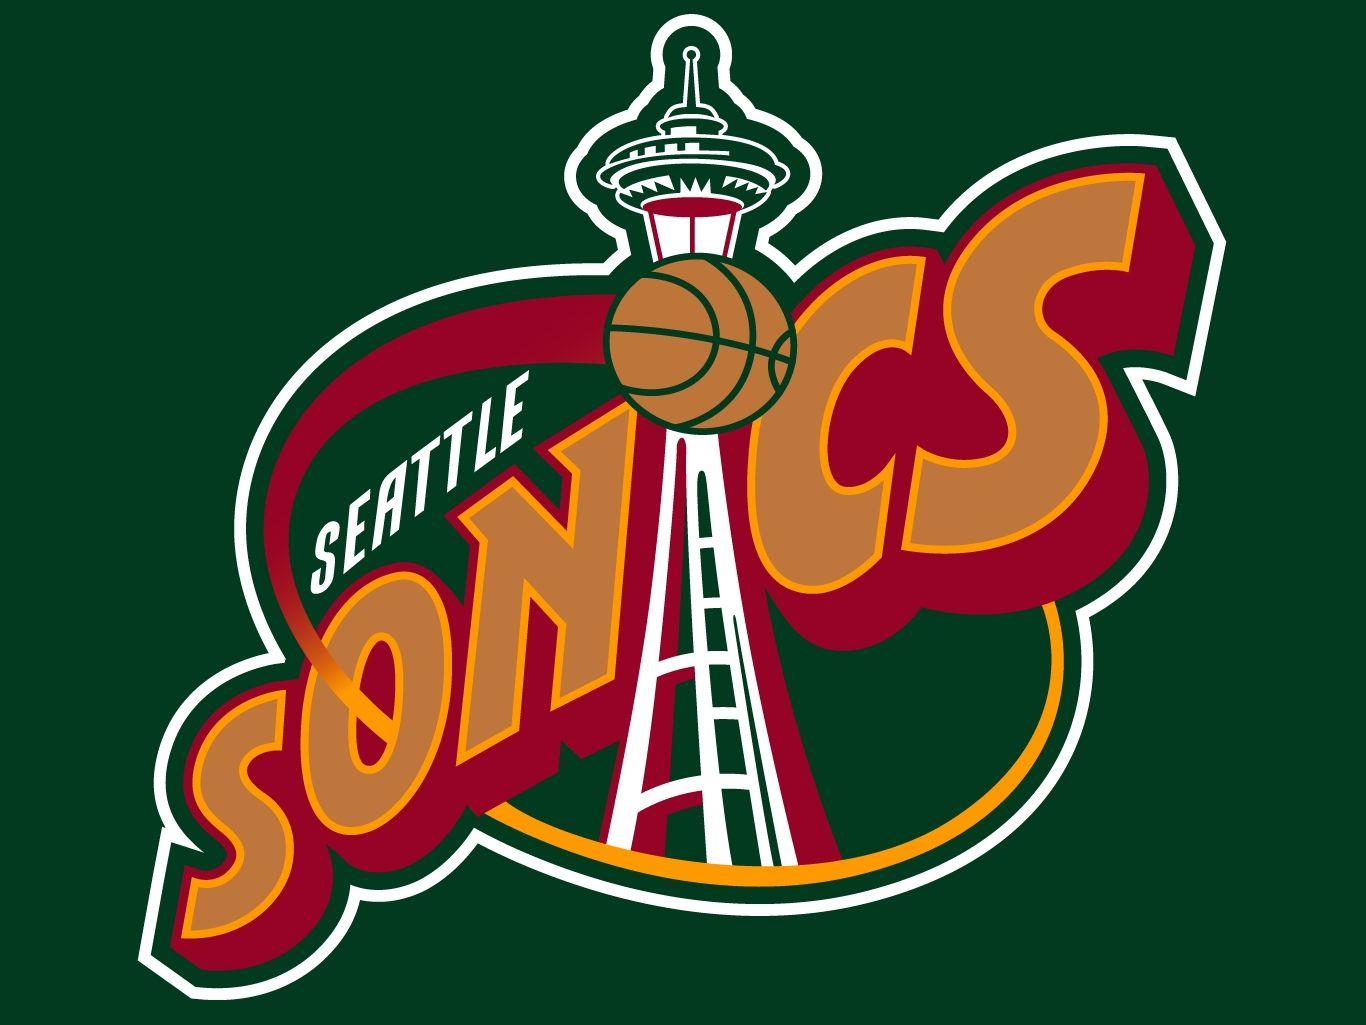 Seattle Supersonics Nba, Patrones amigurumi, Baloncesto